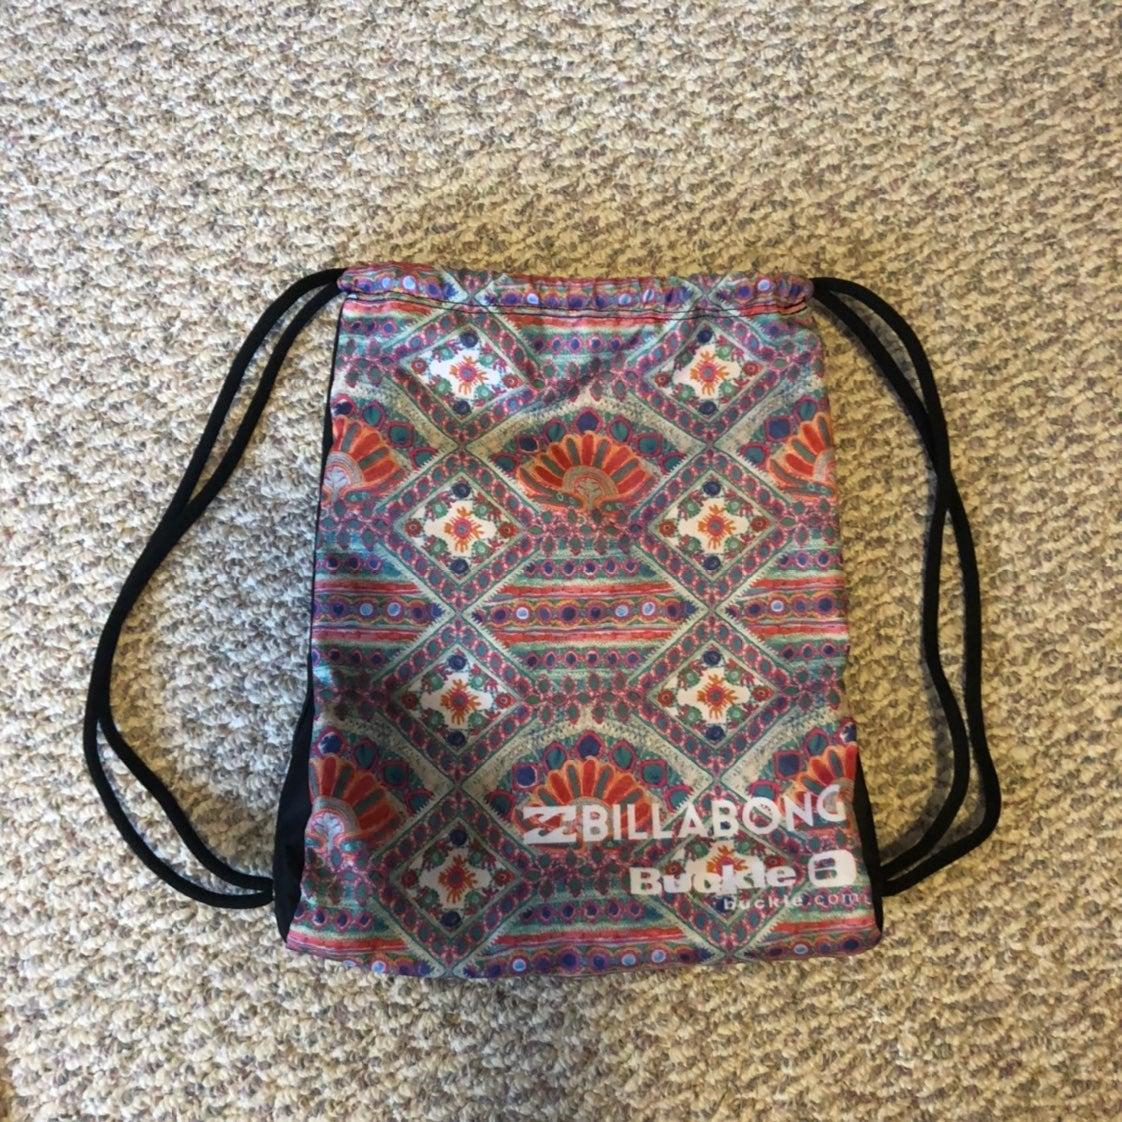 Billabong x Buckle Drawstring Bag